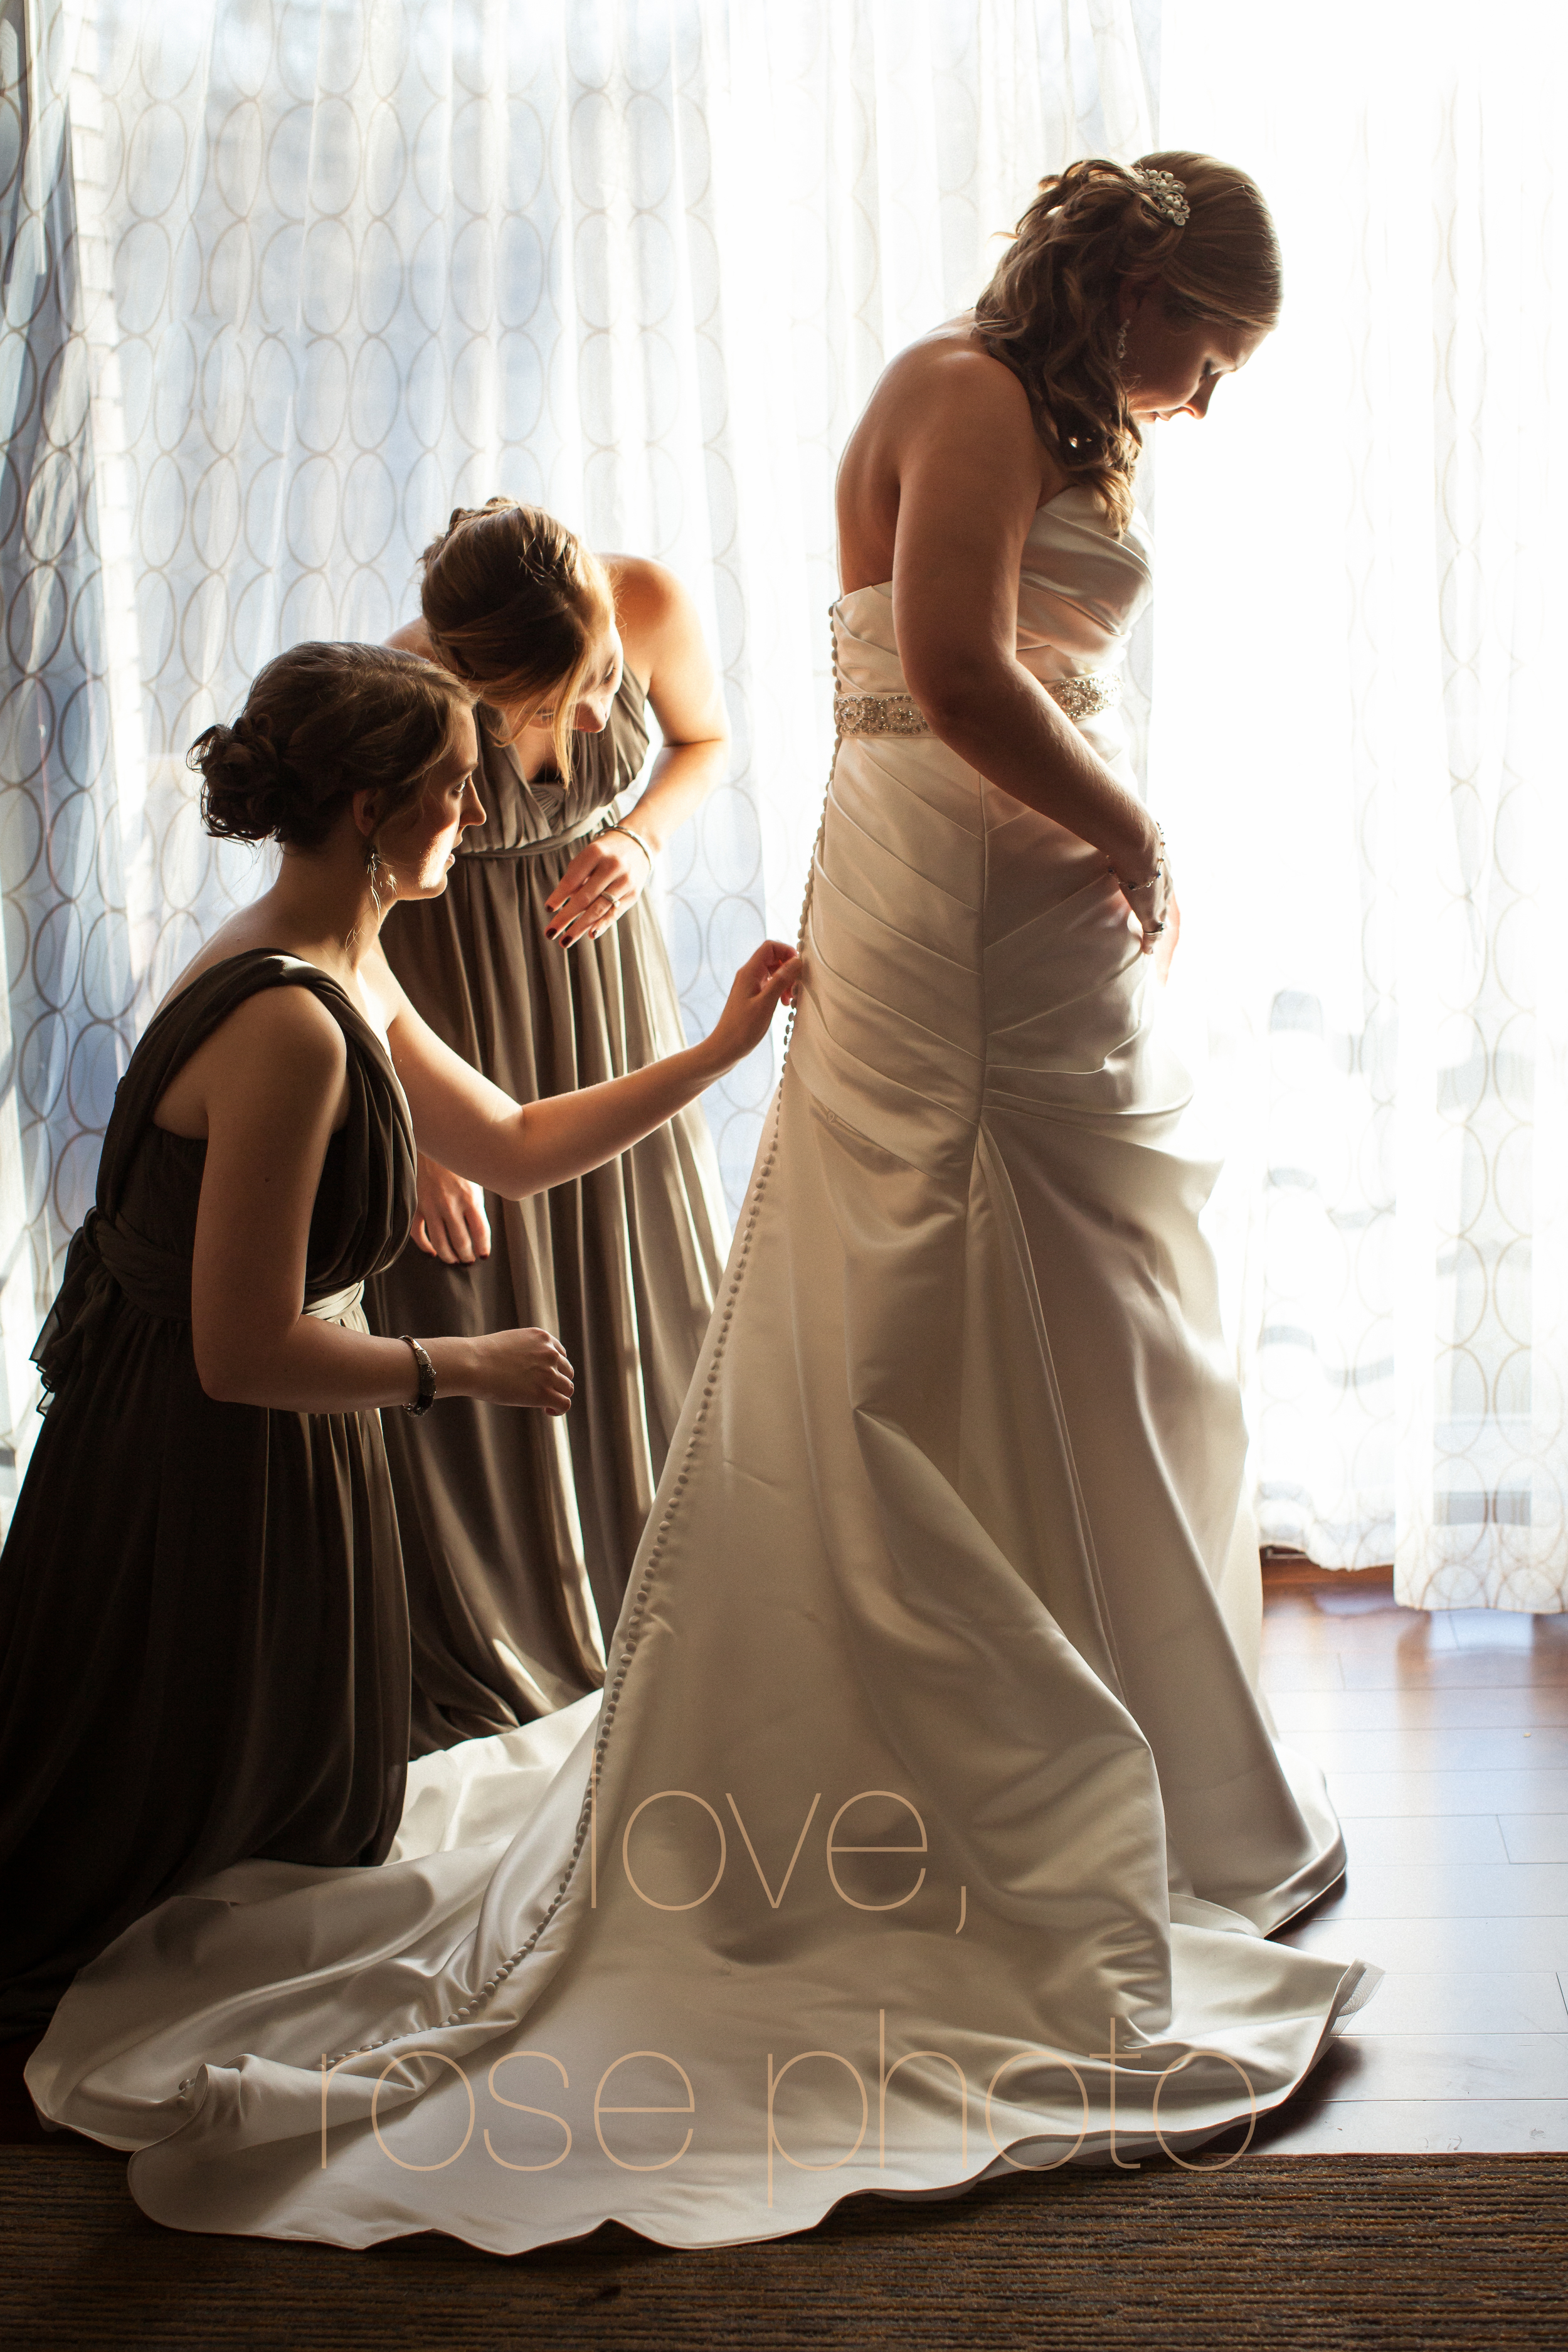 katie + even new years eve chicago oak brook mcdonalds lodge 2014 polish wedding balloon drop champagne-001.jpg